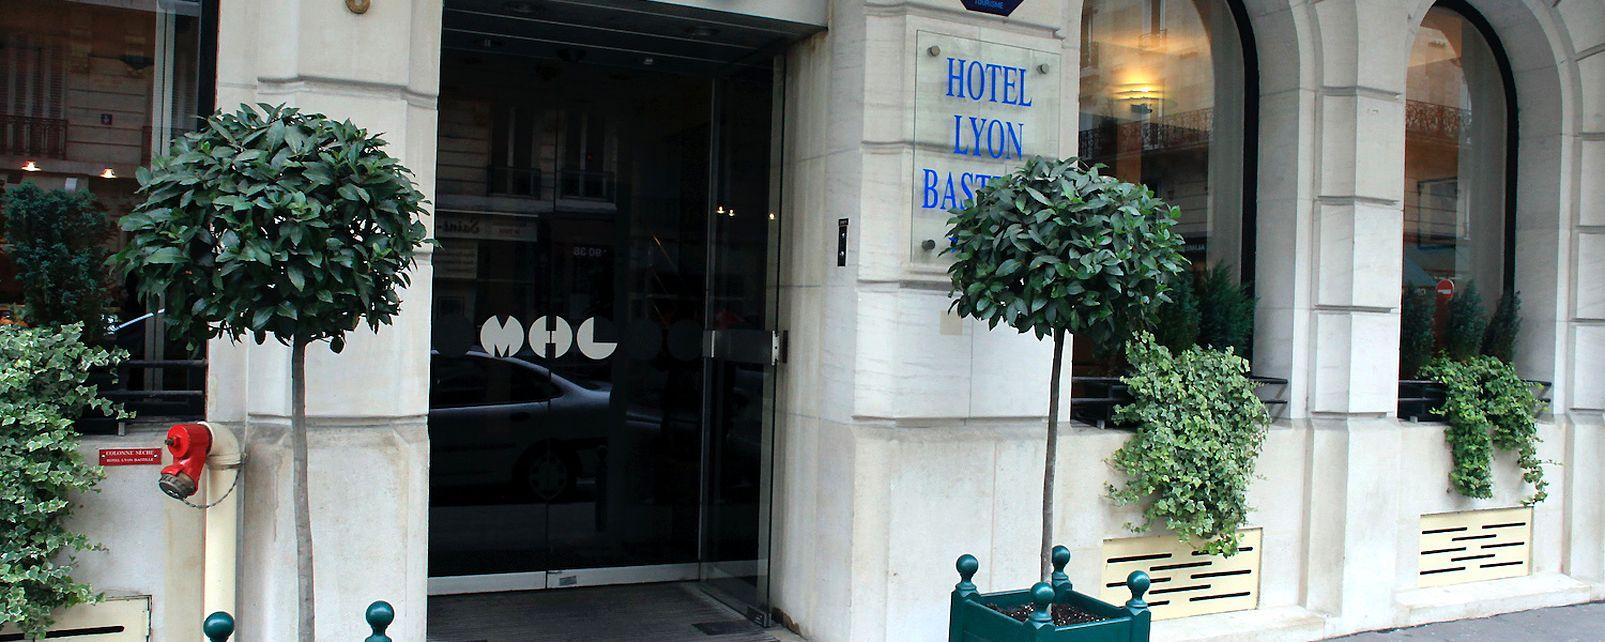 Hôtel Lyon Bastille Hotel Paris